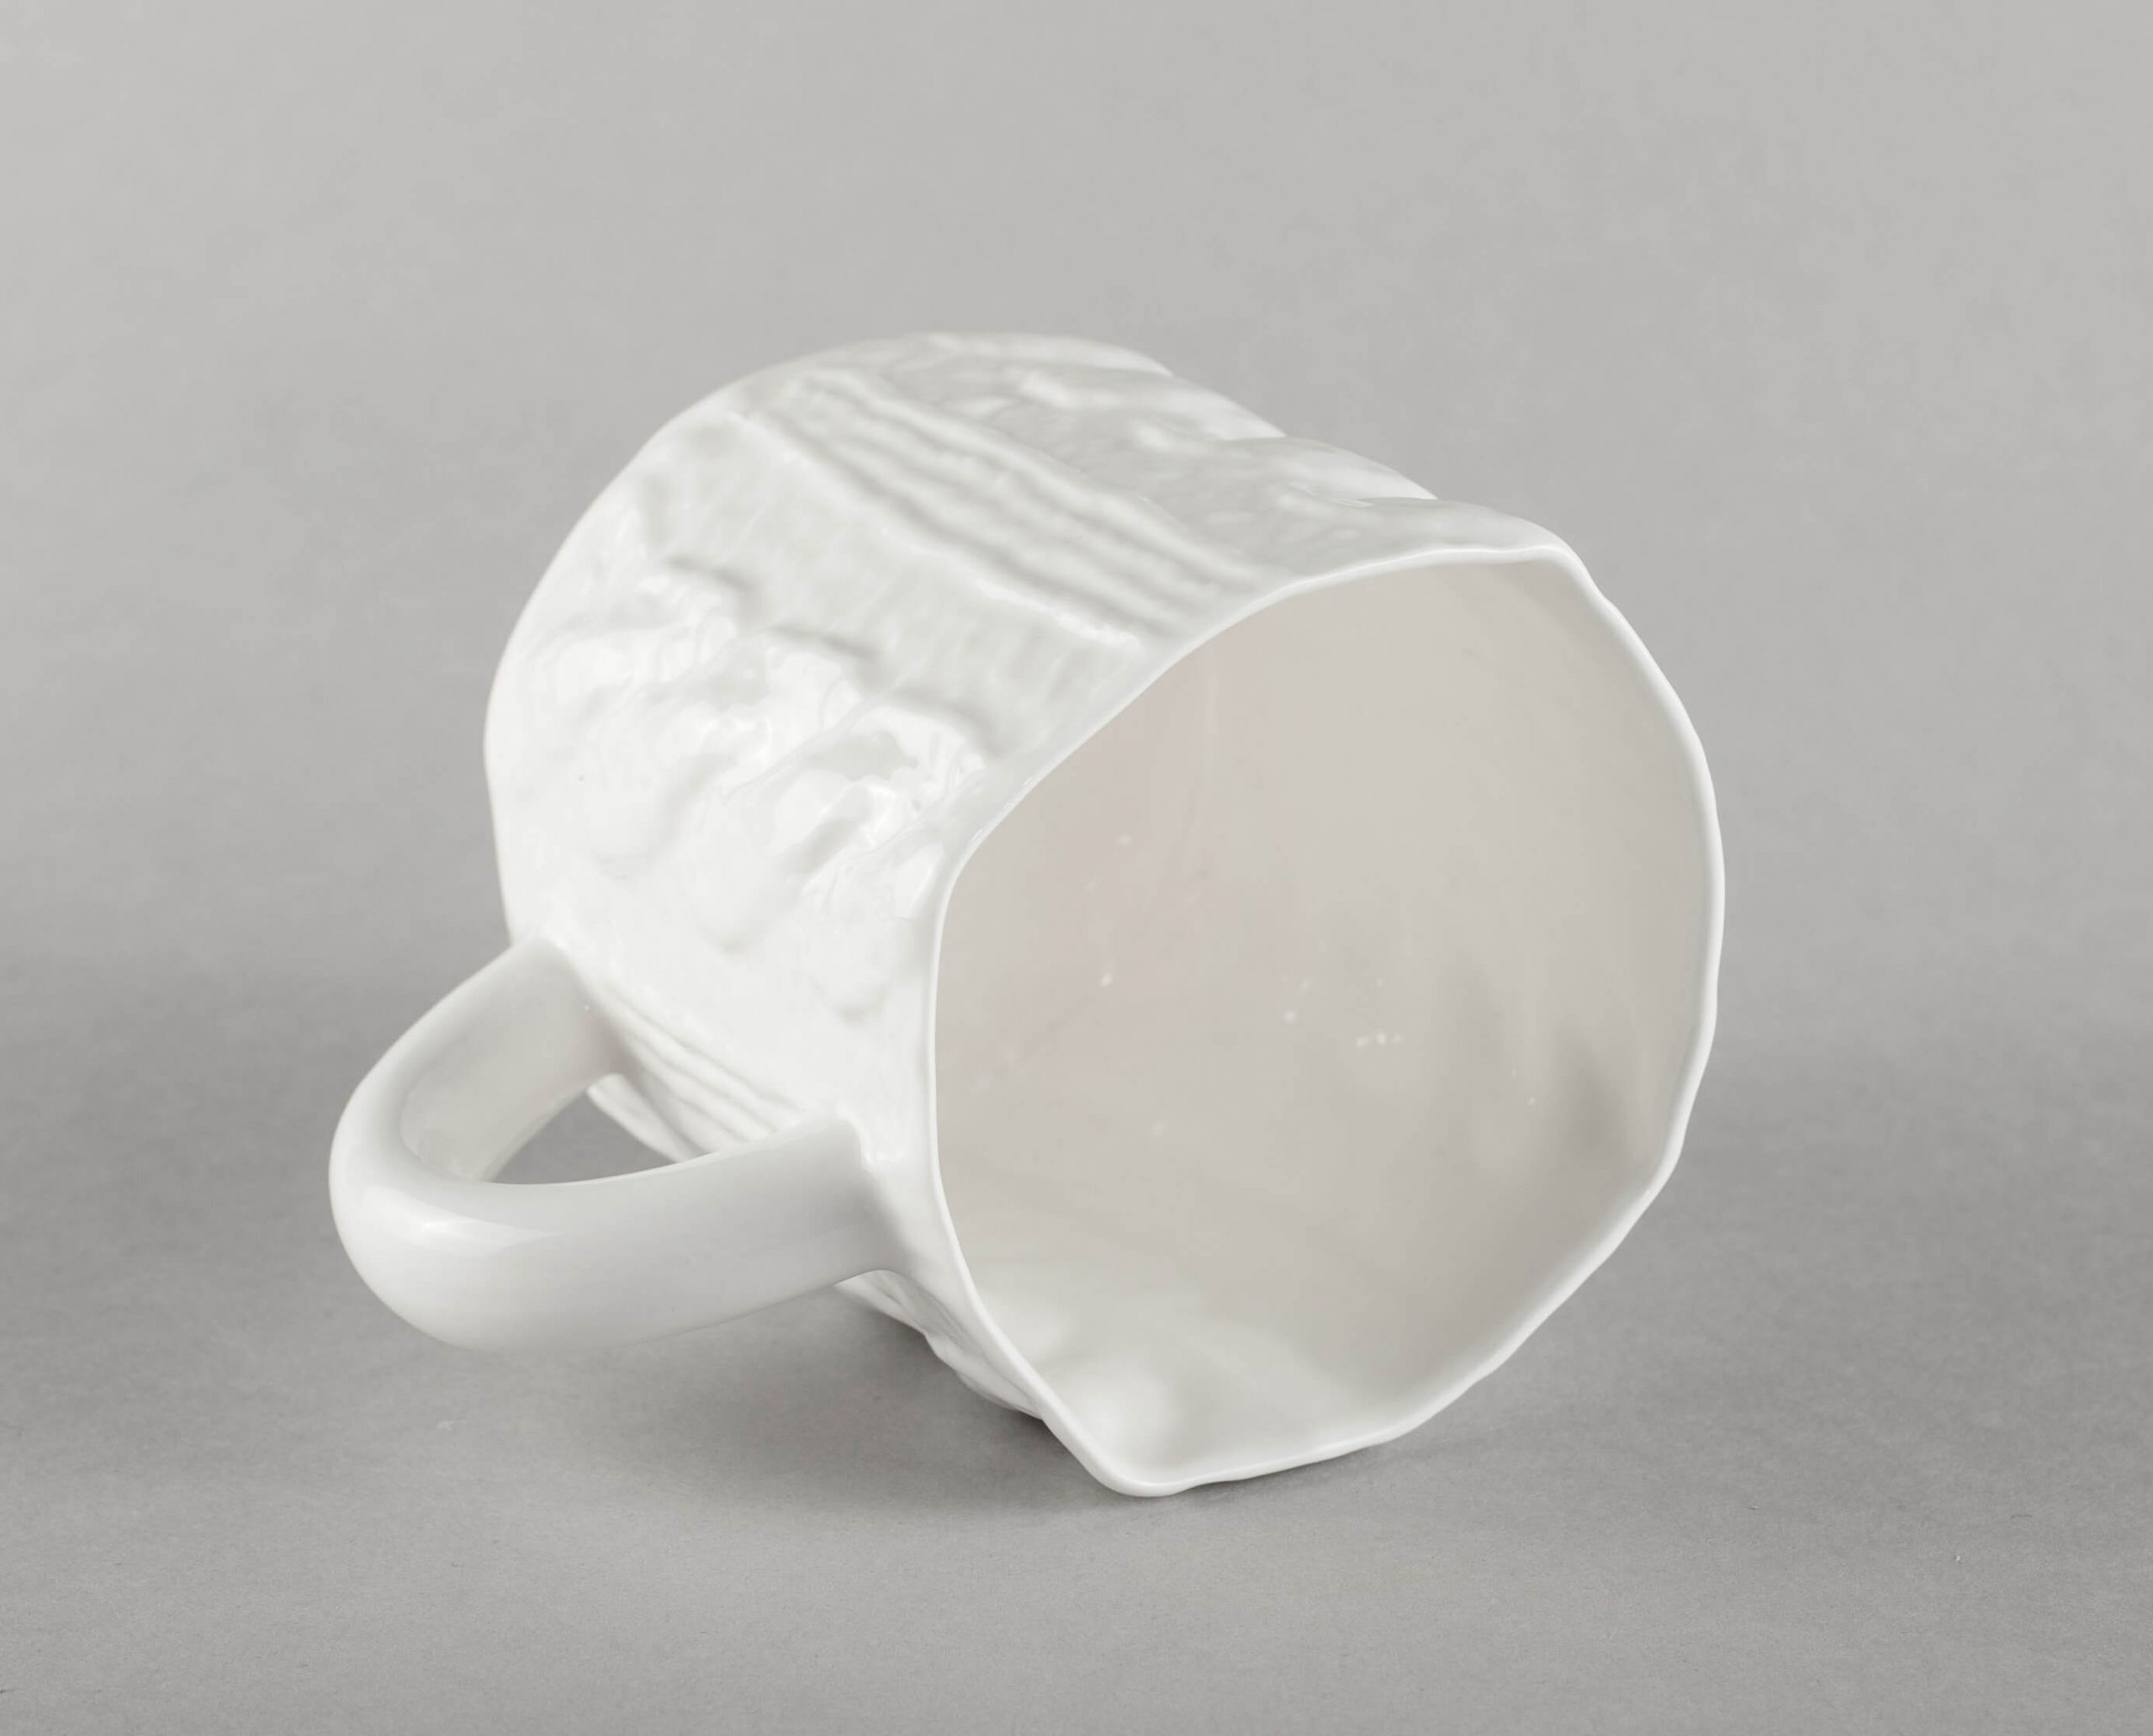 Piebalgas porcelain baltic design 9 scaled Piebalga Porcelain